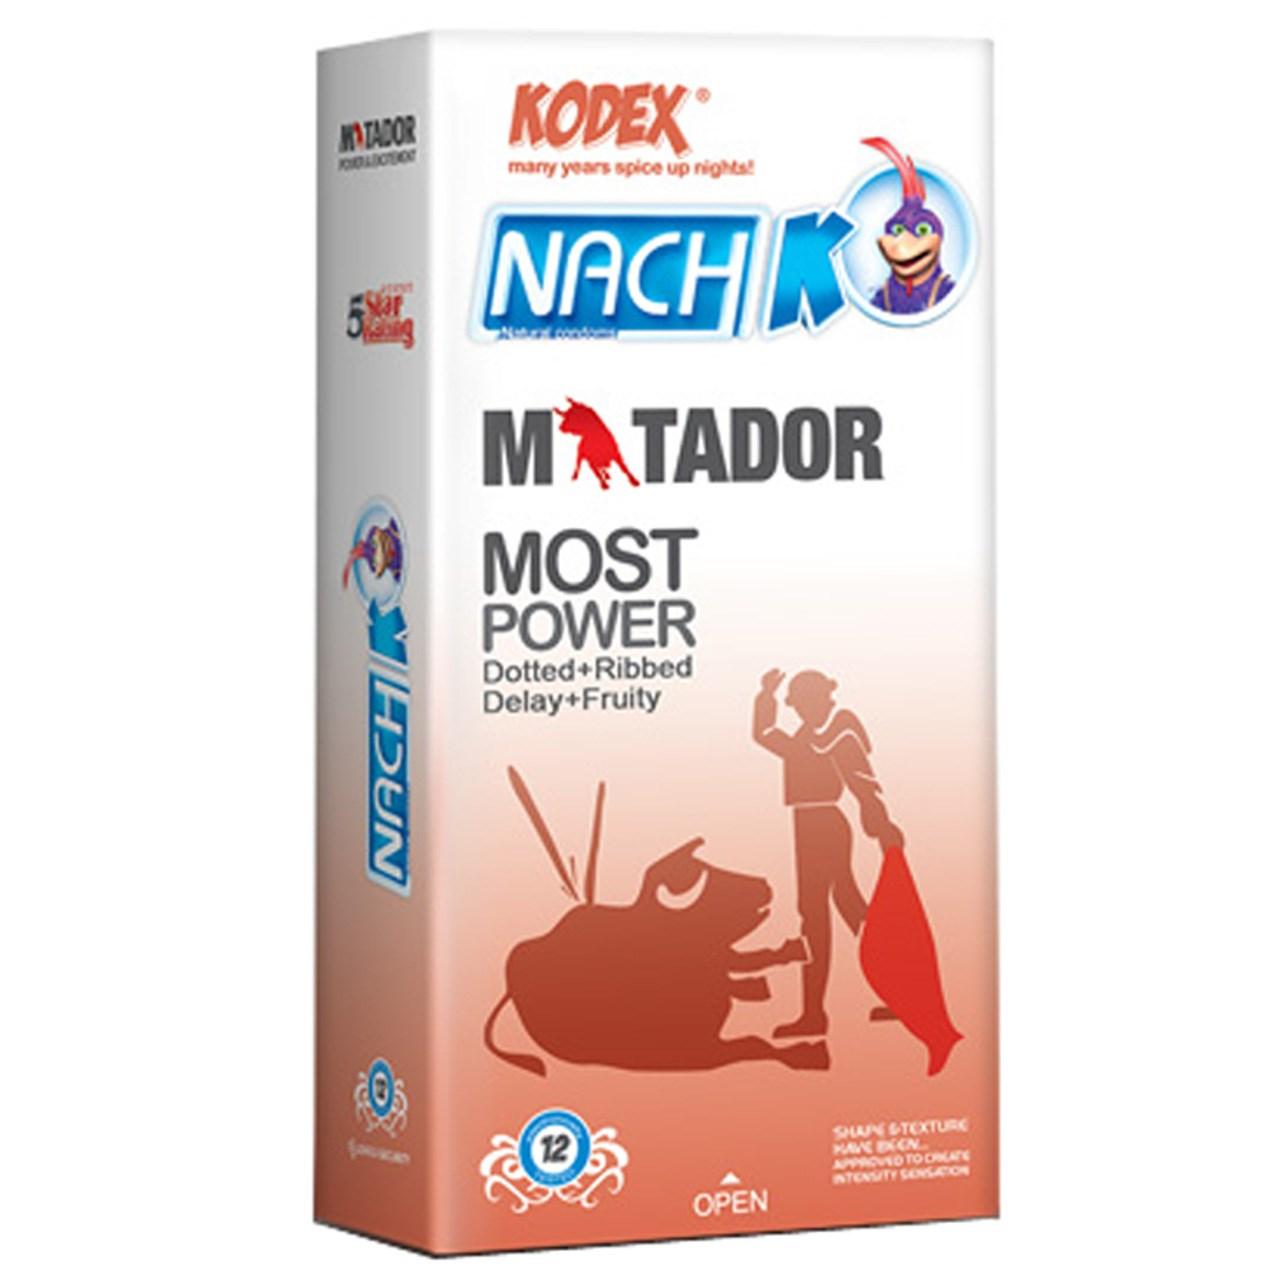 کاندوم خاردار و حلقوی کدکس مدل Matador بسته 12 عددی